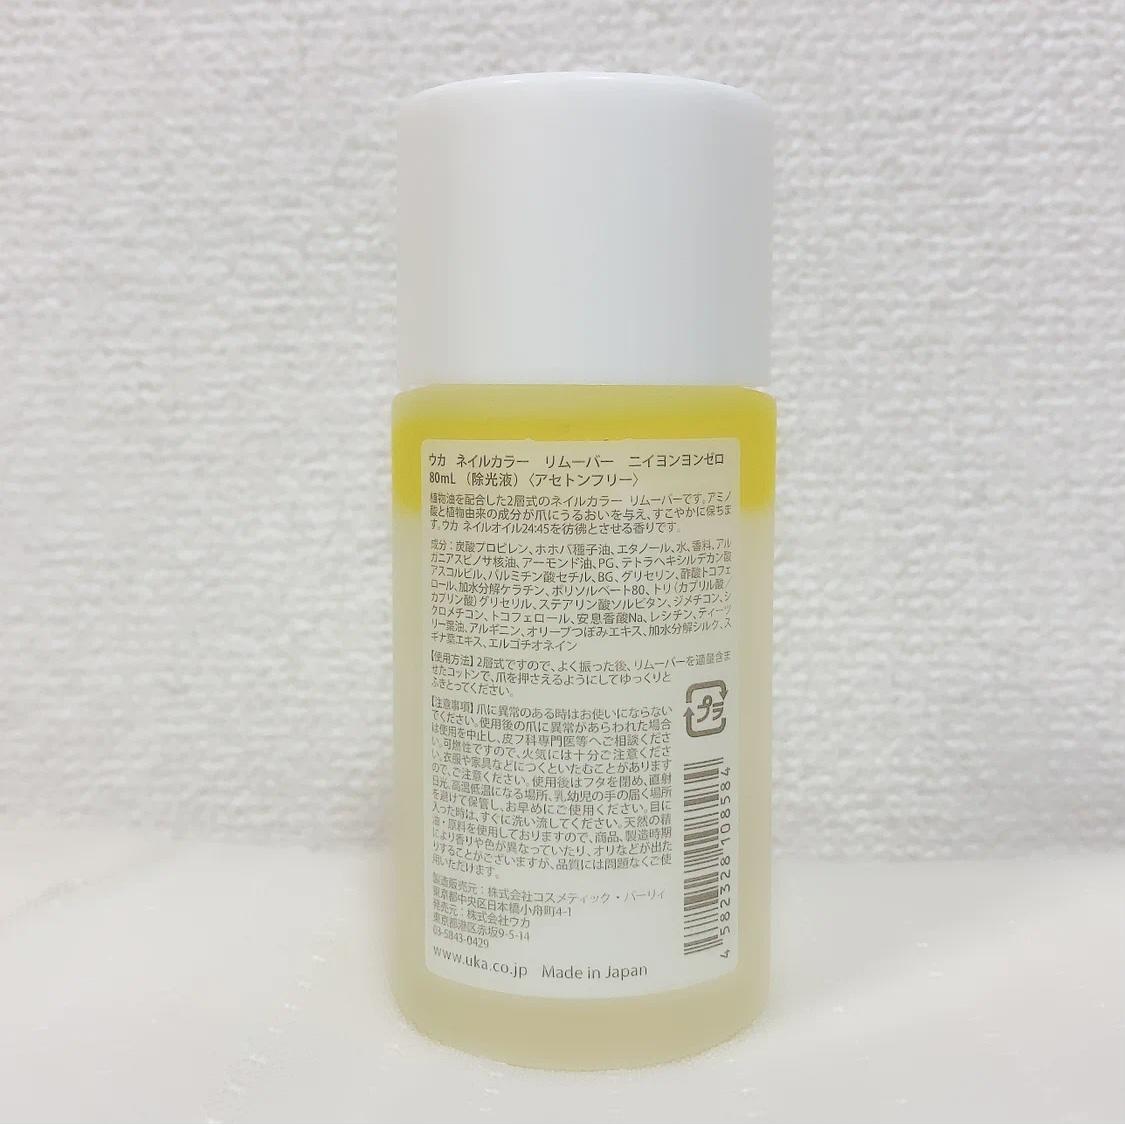 uka(ウカ)nail color remover 24:40を使った只野ひとみさんのクチコミ画像2